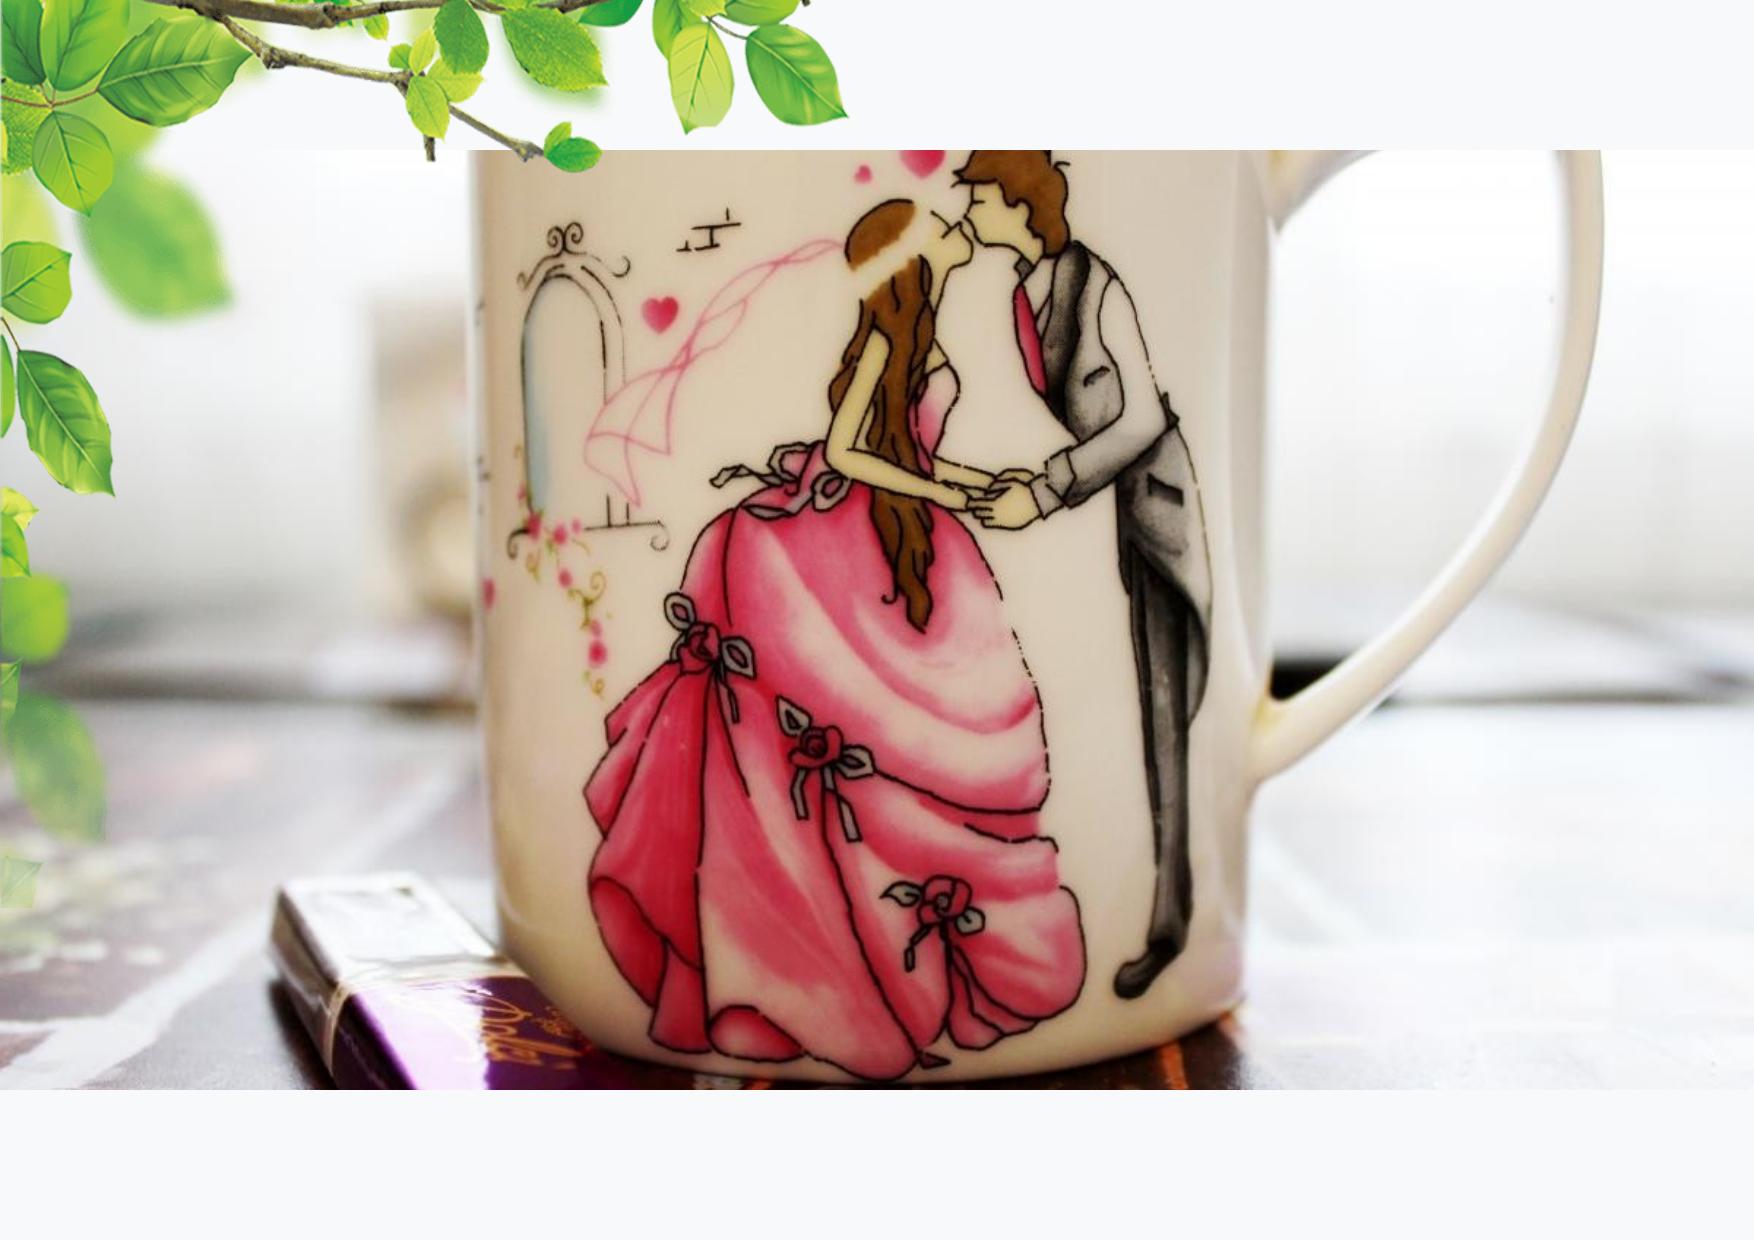 Pink,                Flower,                Image,                Avatar,                White,                 Free Image